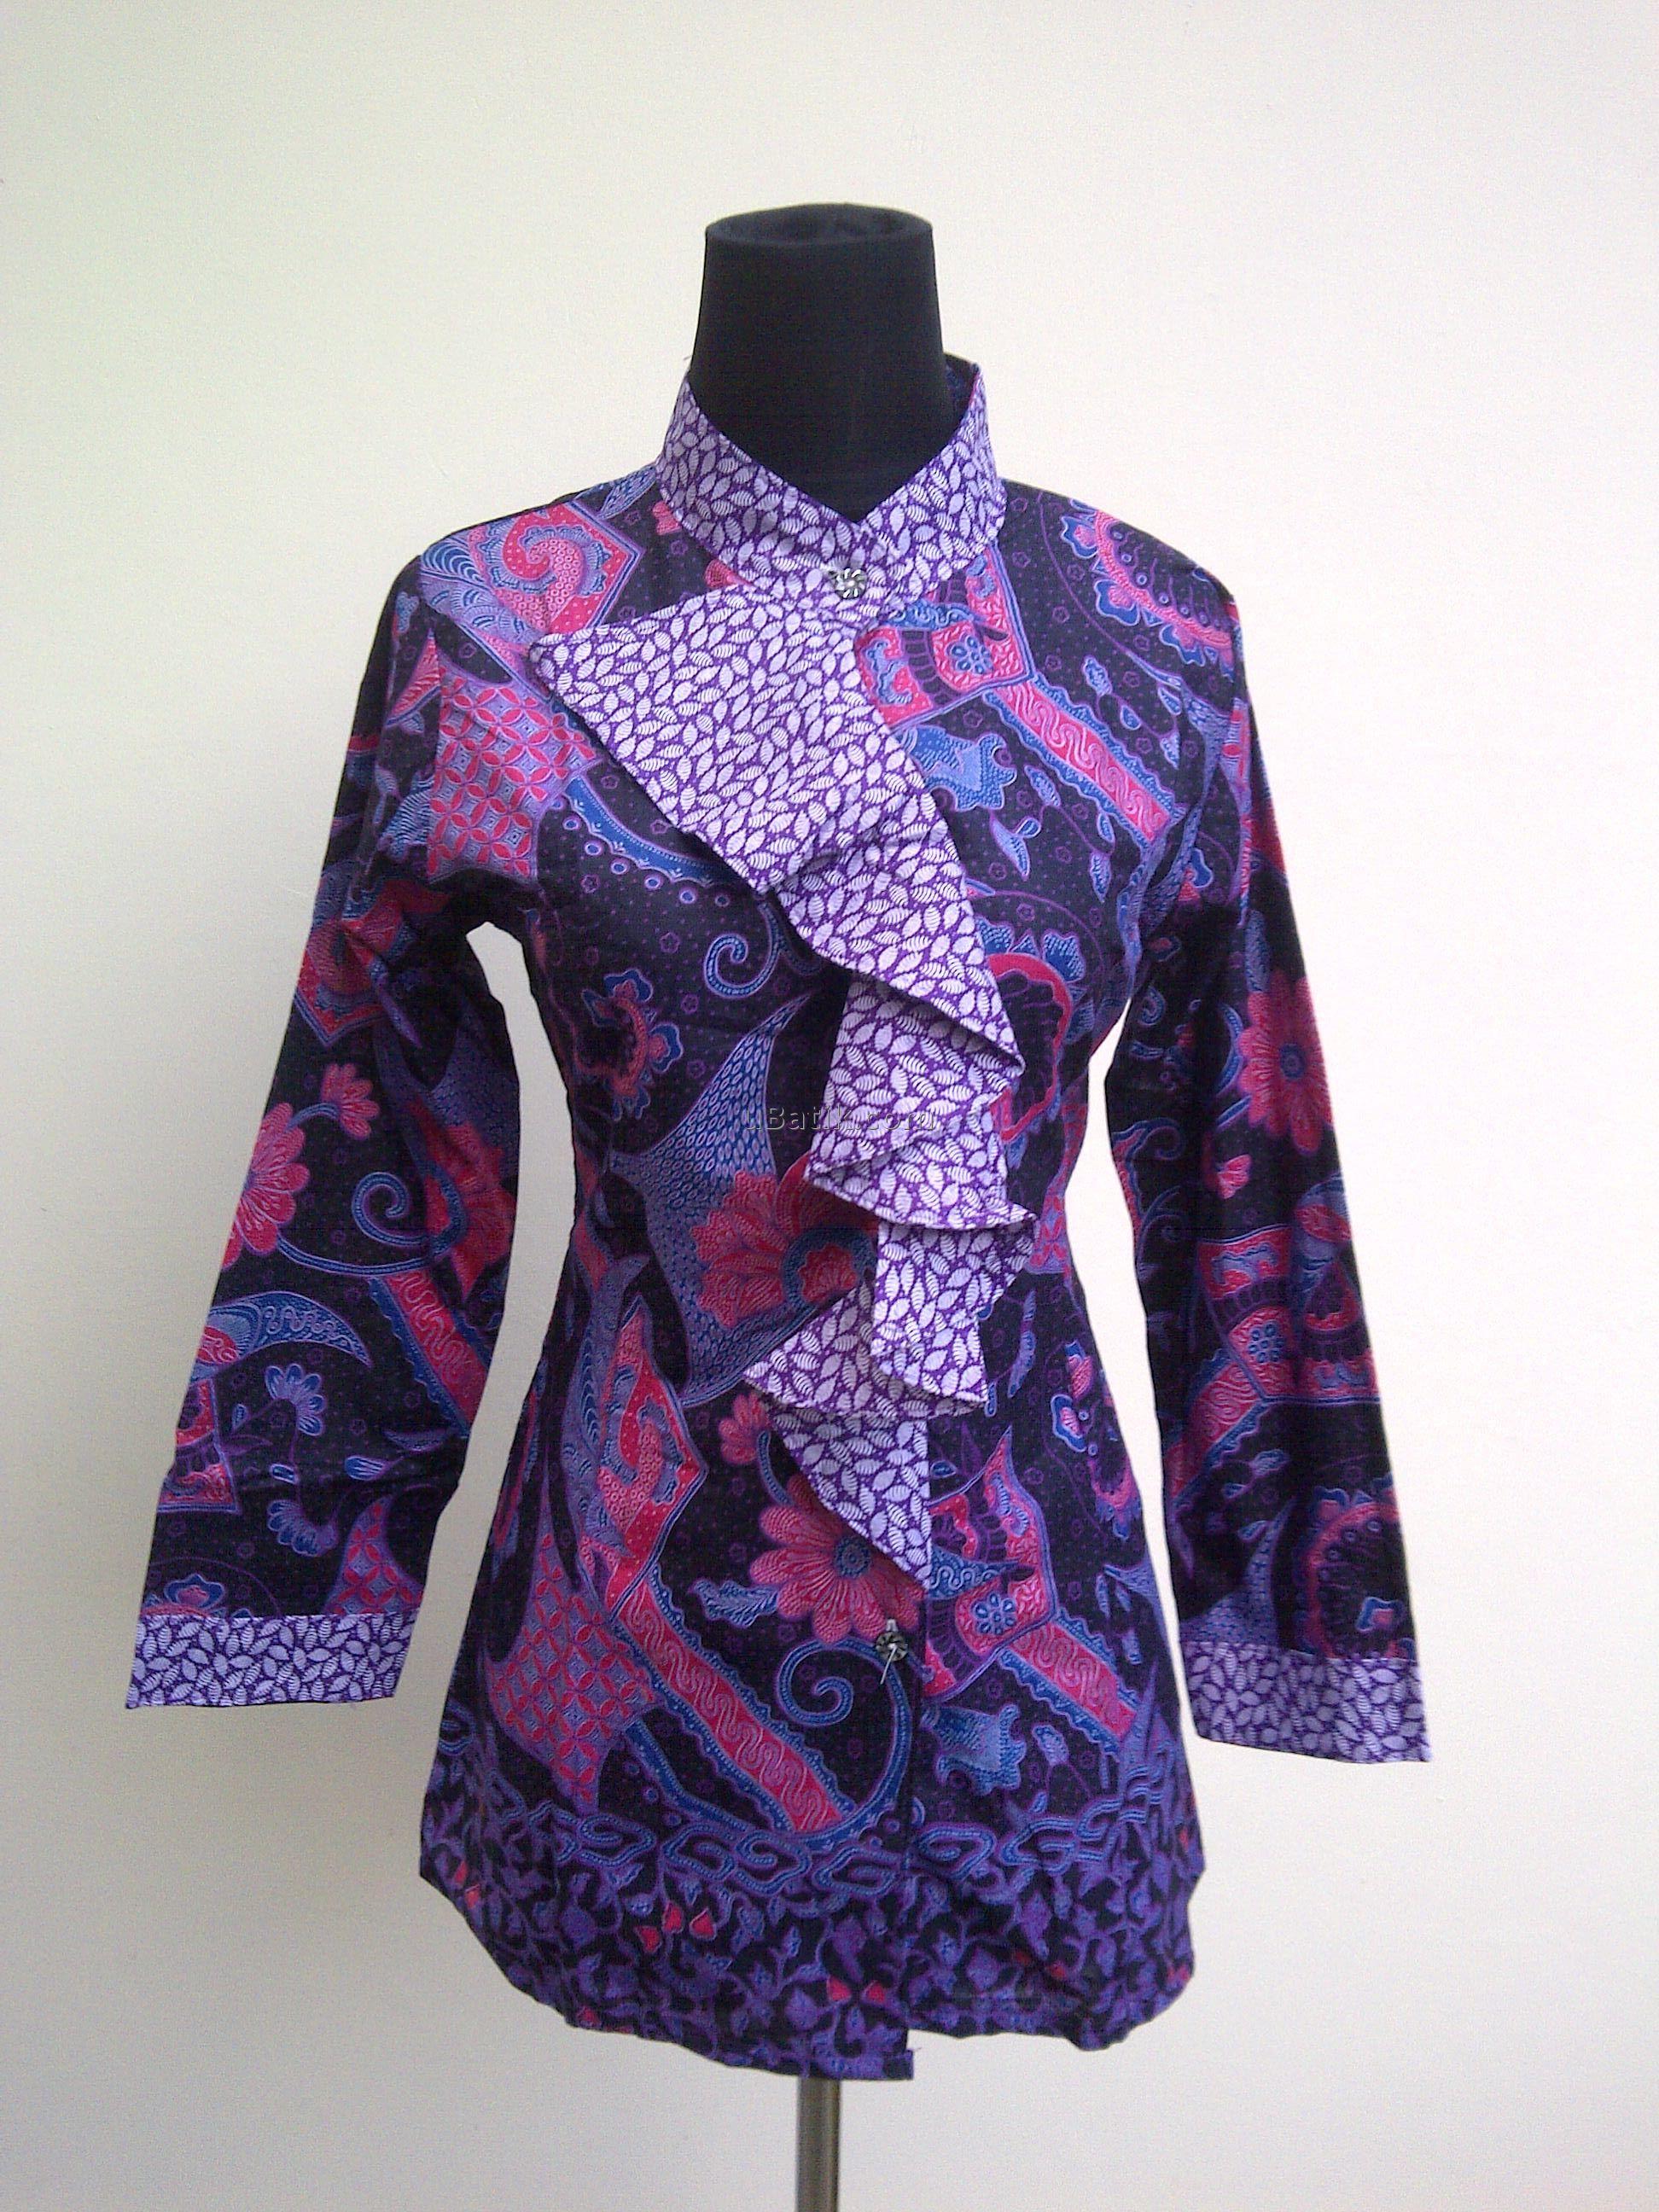 bagaimana jika Anda mengaplikasikan beberapa model baju kerja batik wanita  di bawah ini sebagai refreshment pekerjaan a410e95554